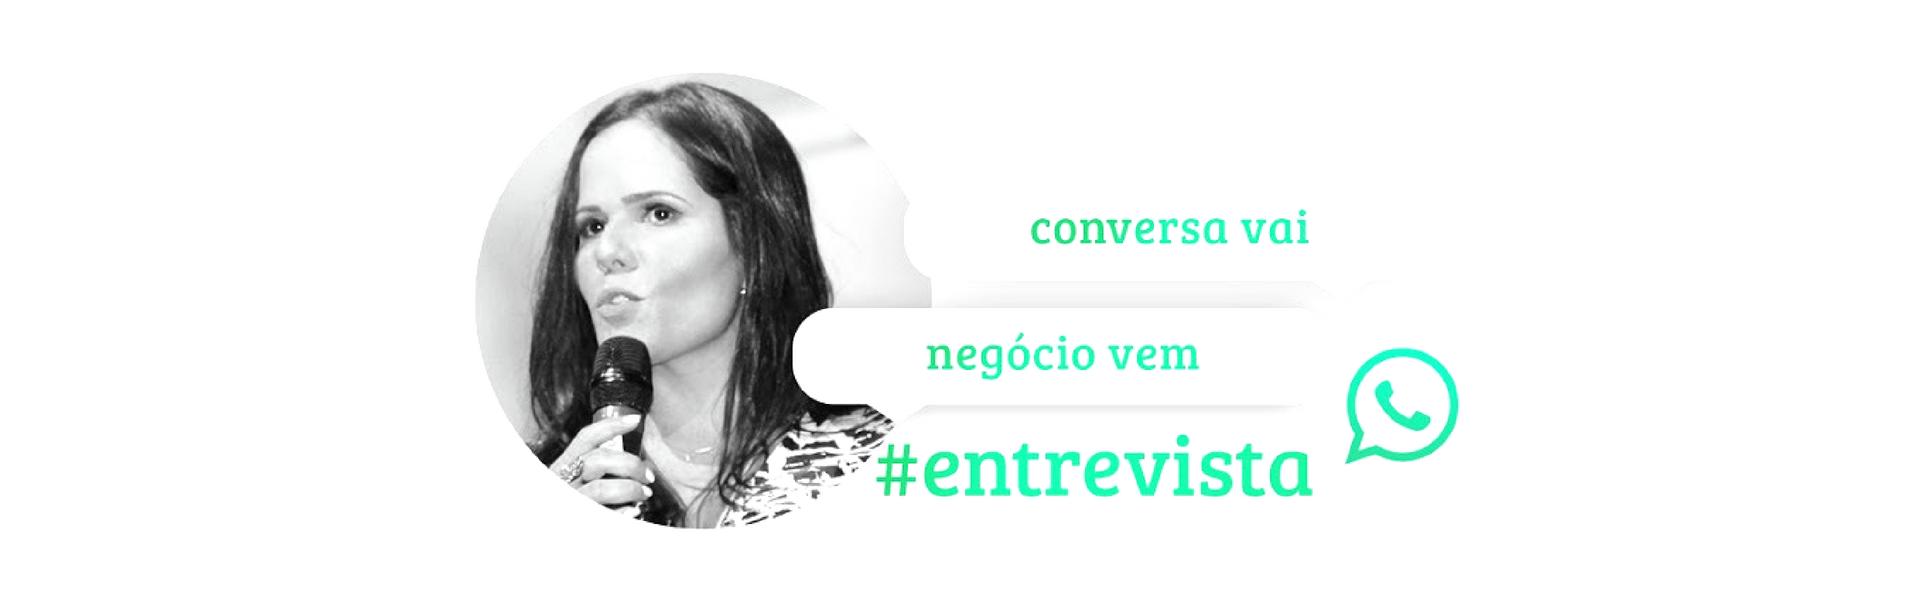 Conversa vai, negócio vem #02 - Flavia Gamonar